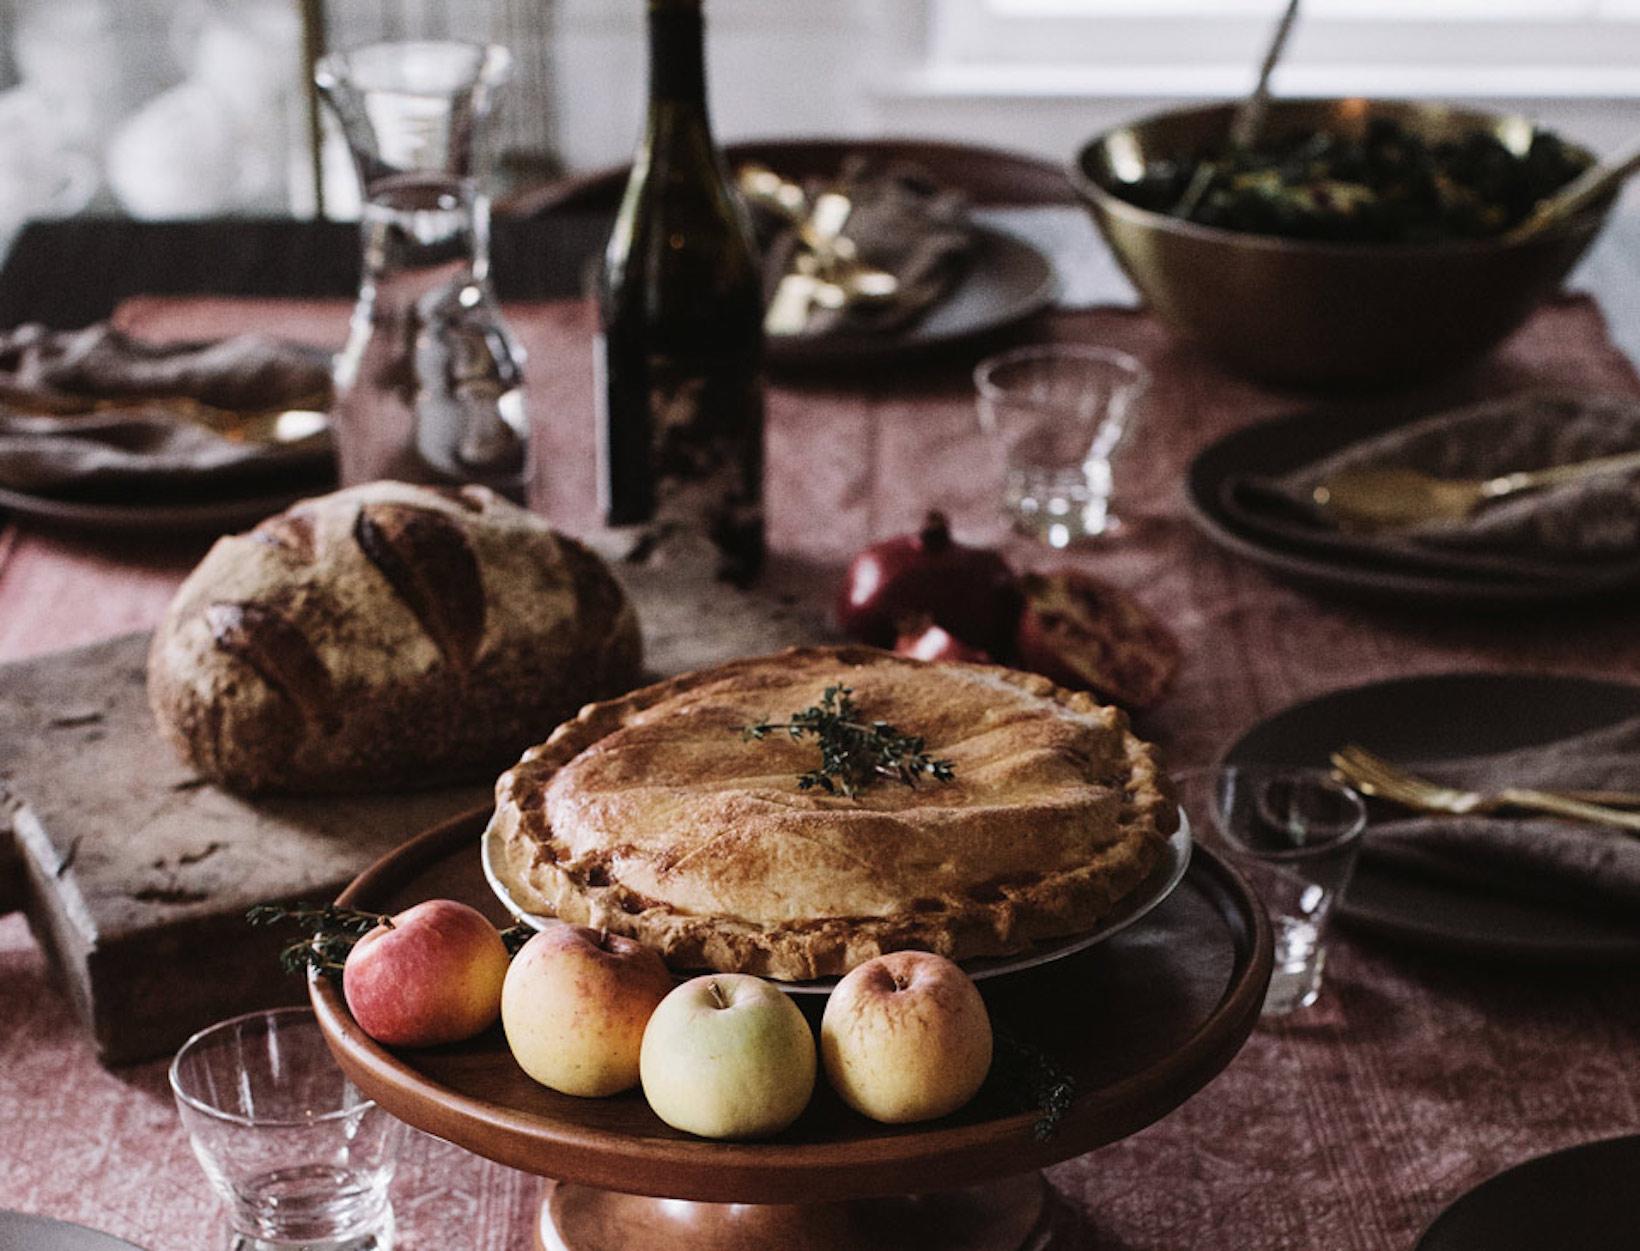 pie on dinner table